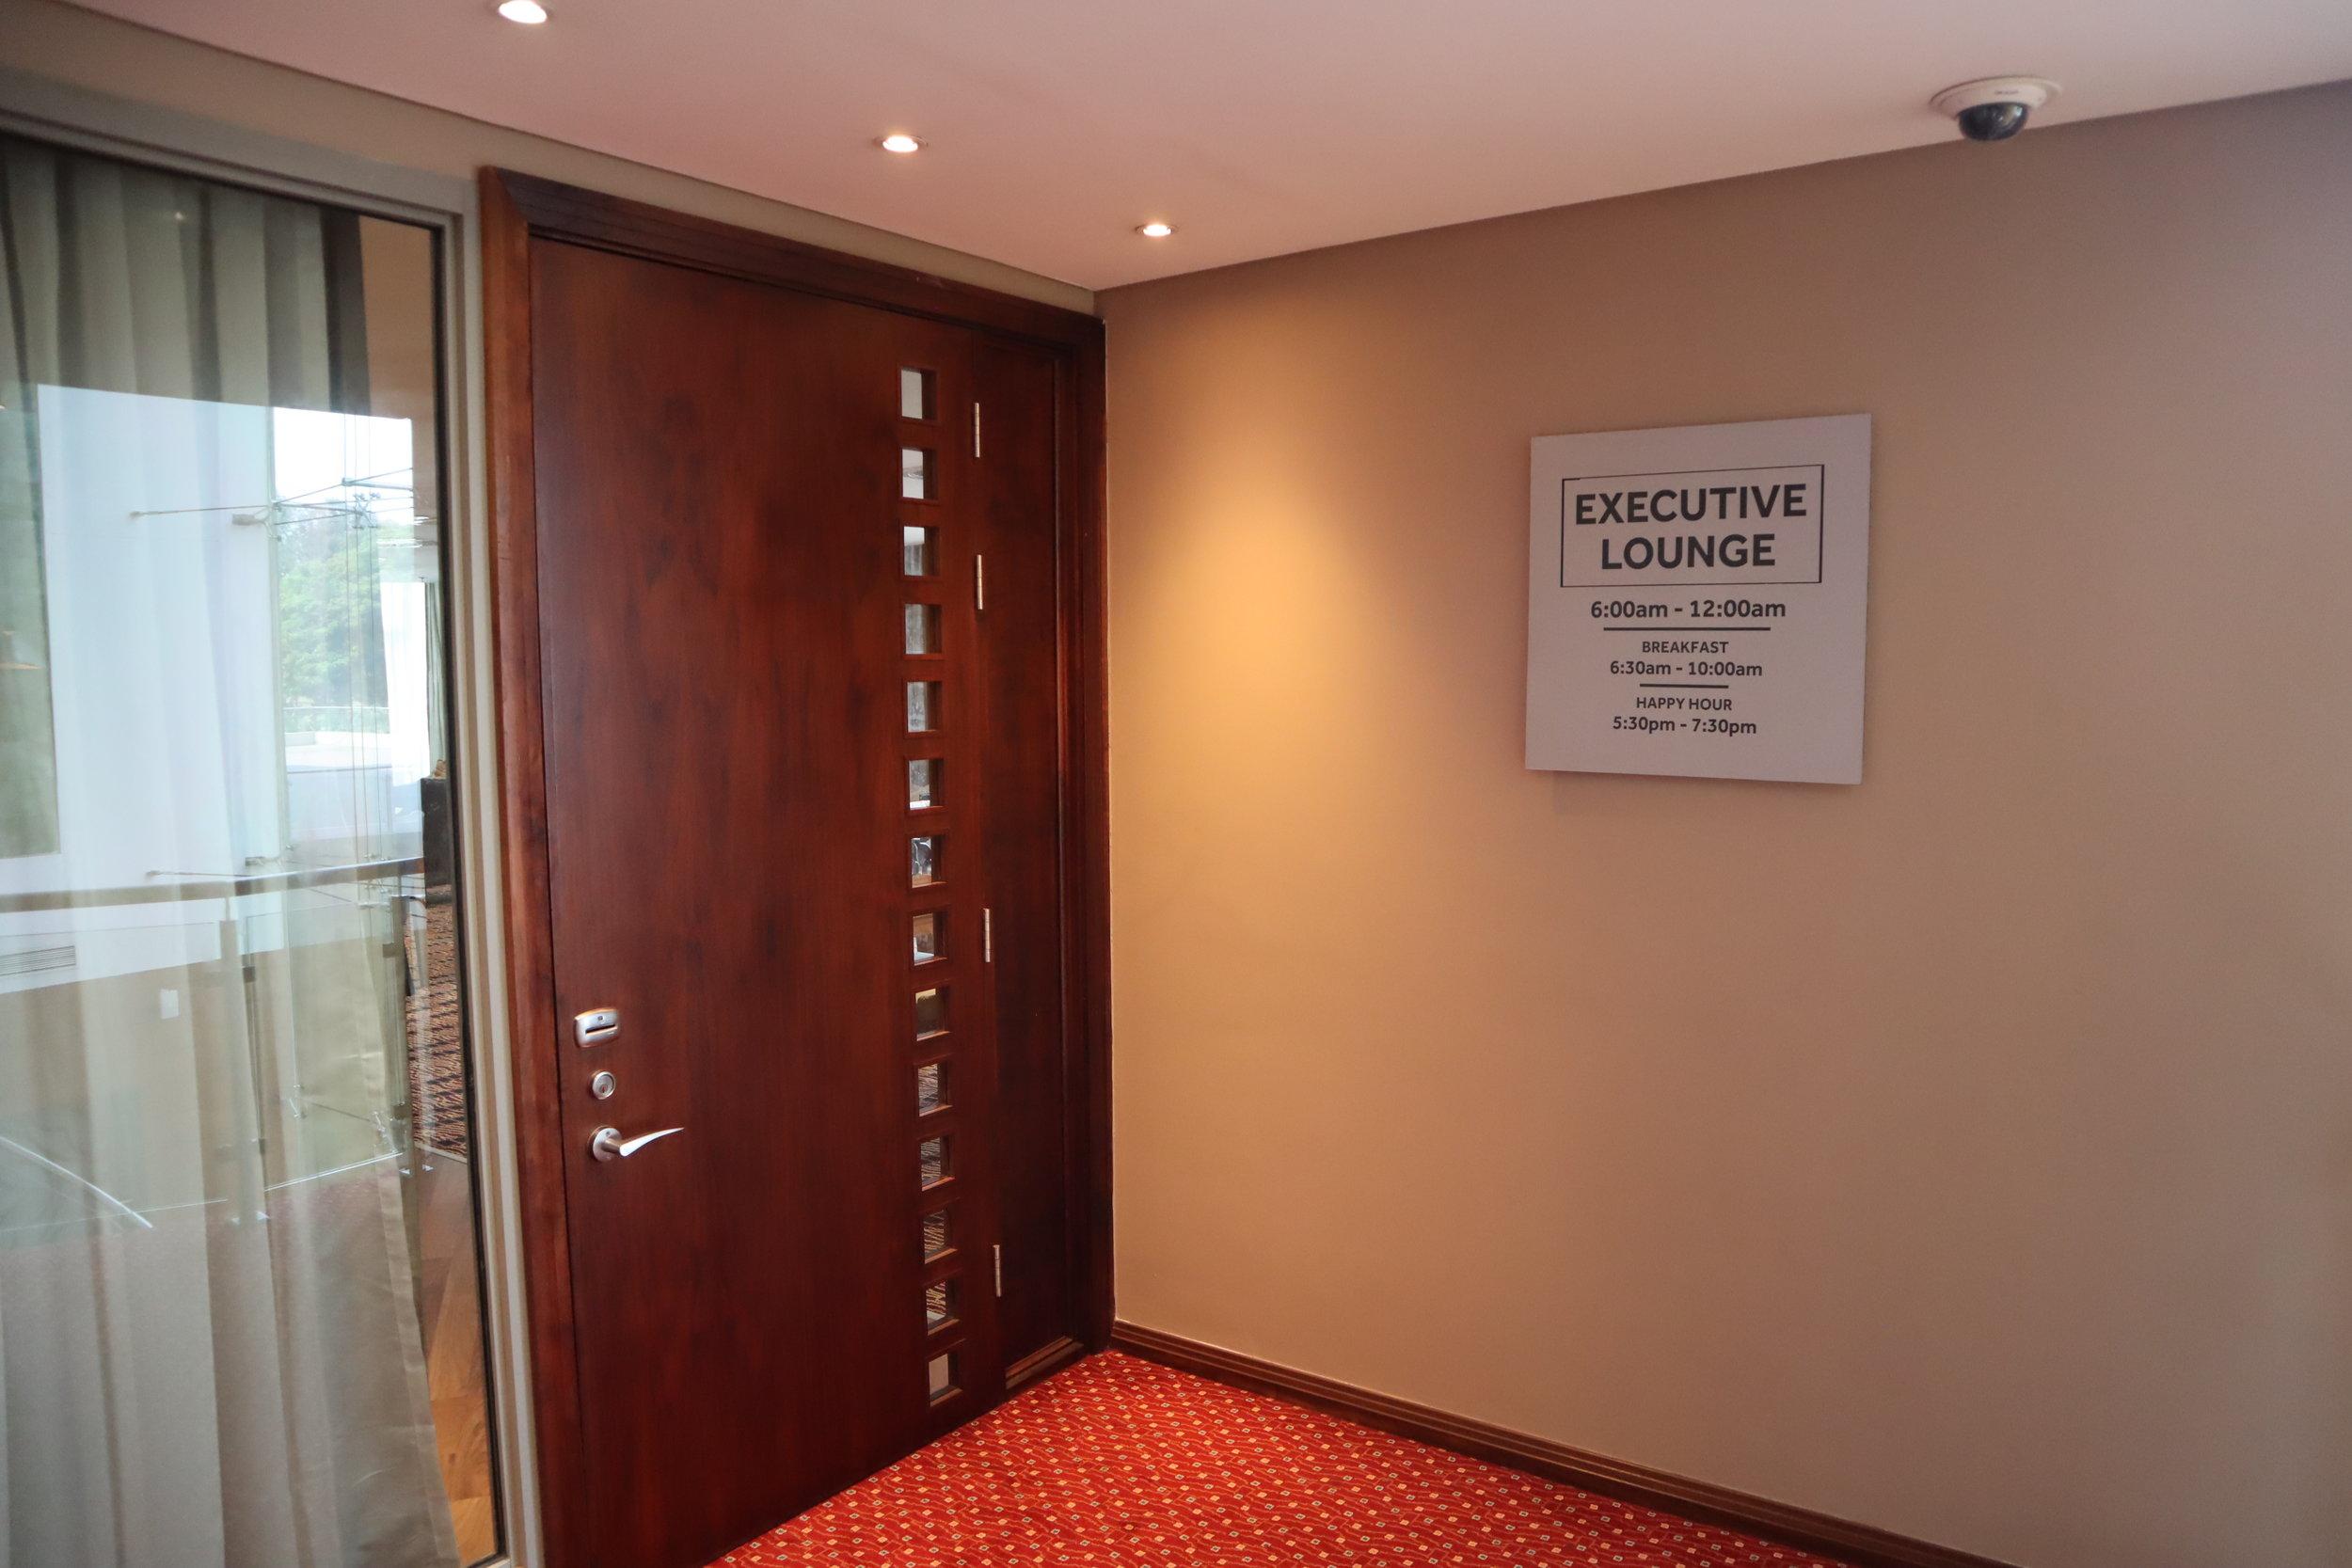 Marriott Accra – Executive Lounge